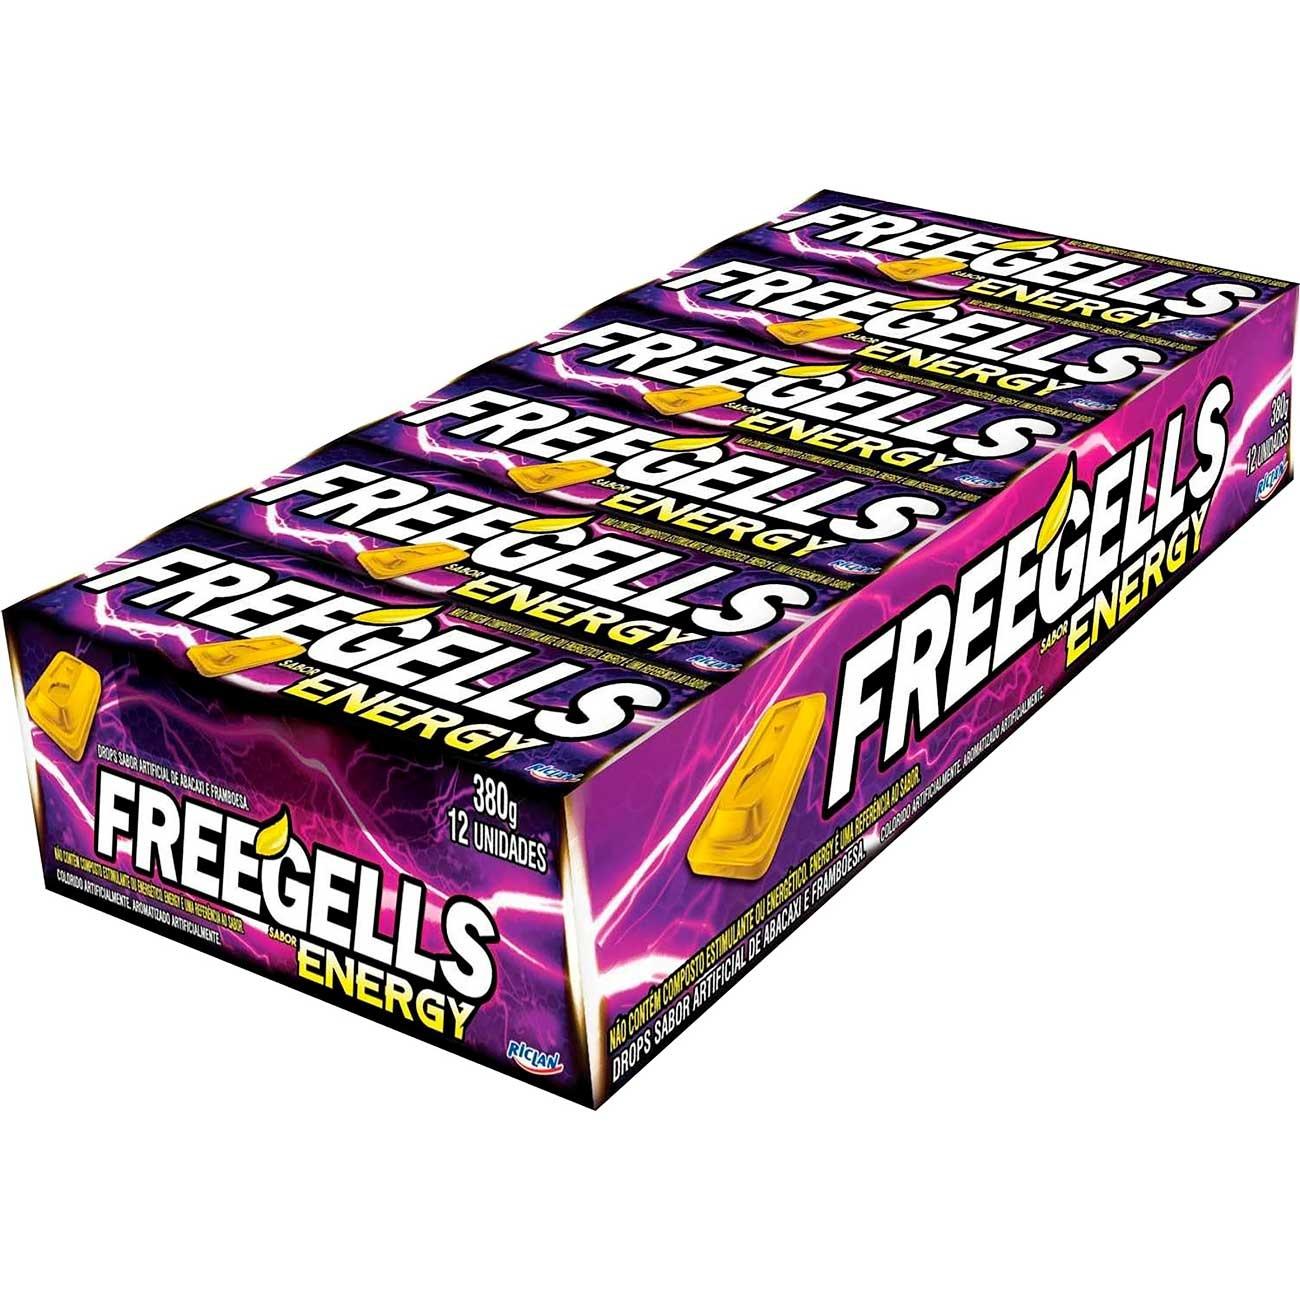 Drops Freegells Energy | Caixa com 12 unidades